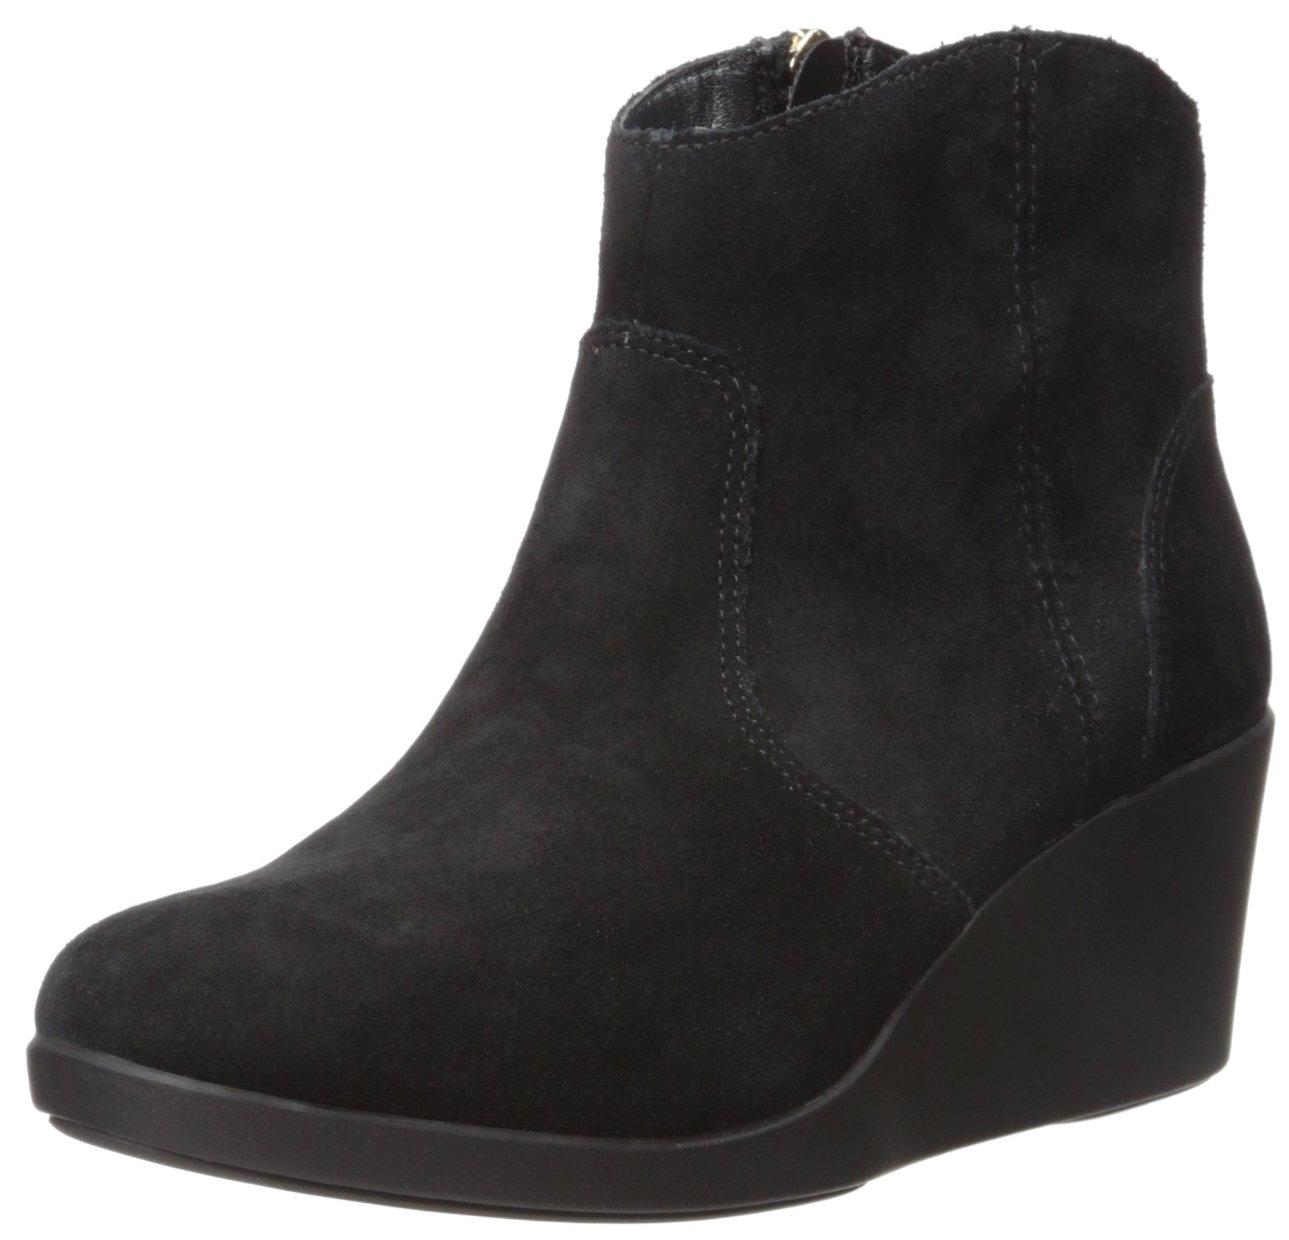 Crocs Women's Leigh Suede Wedge Boot B01A6LKKBG 11 M US|Black